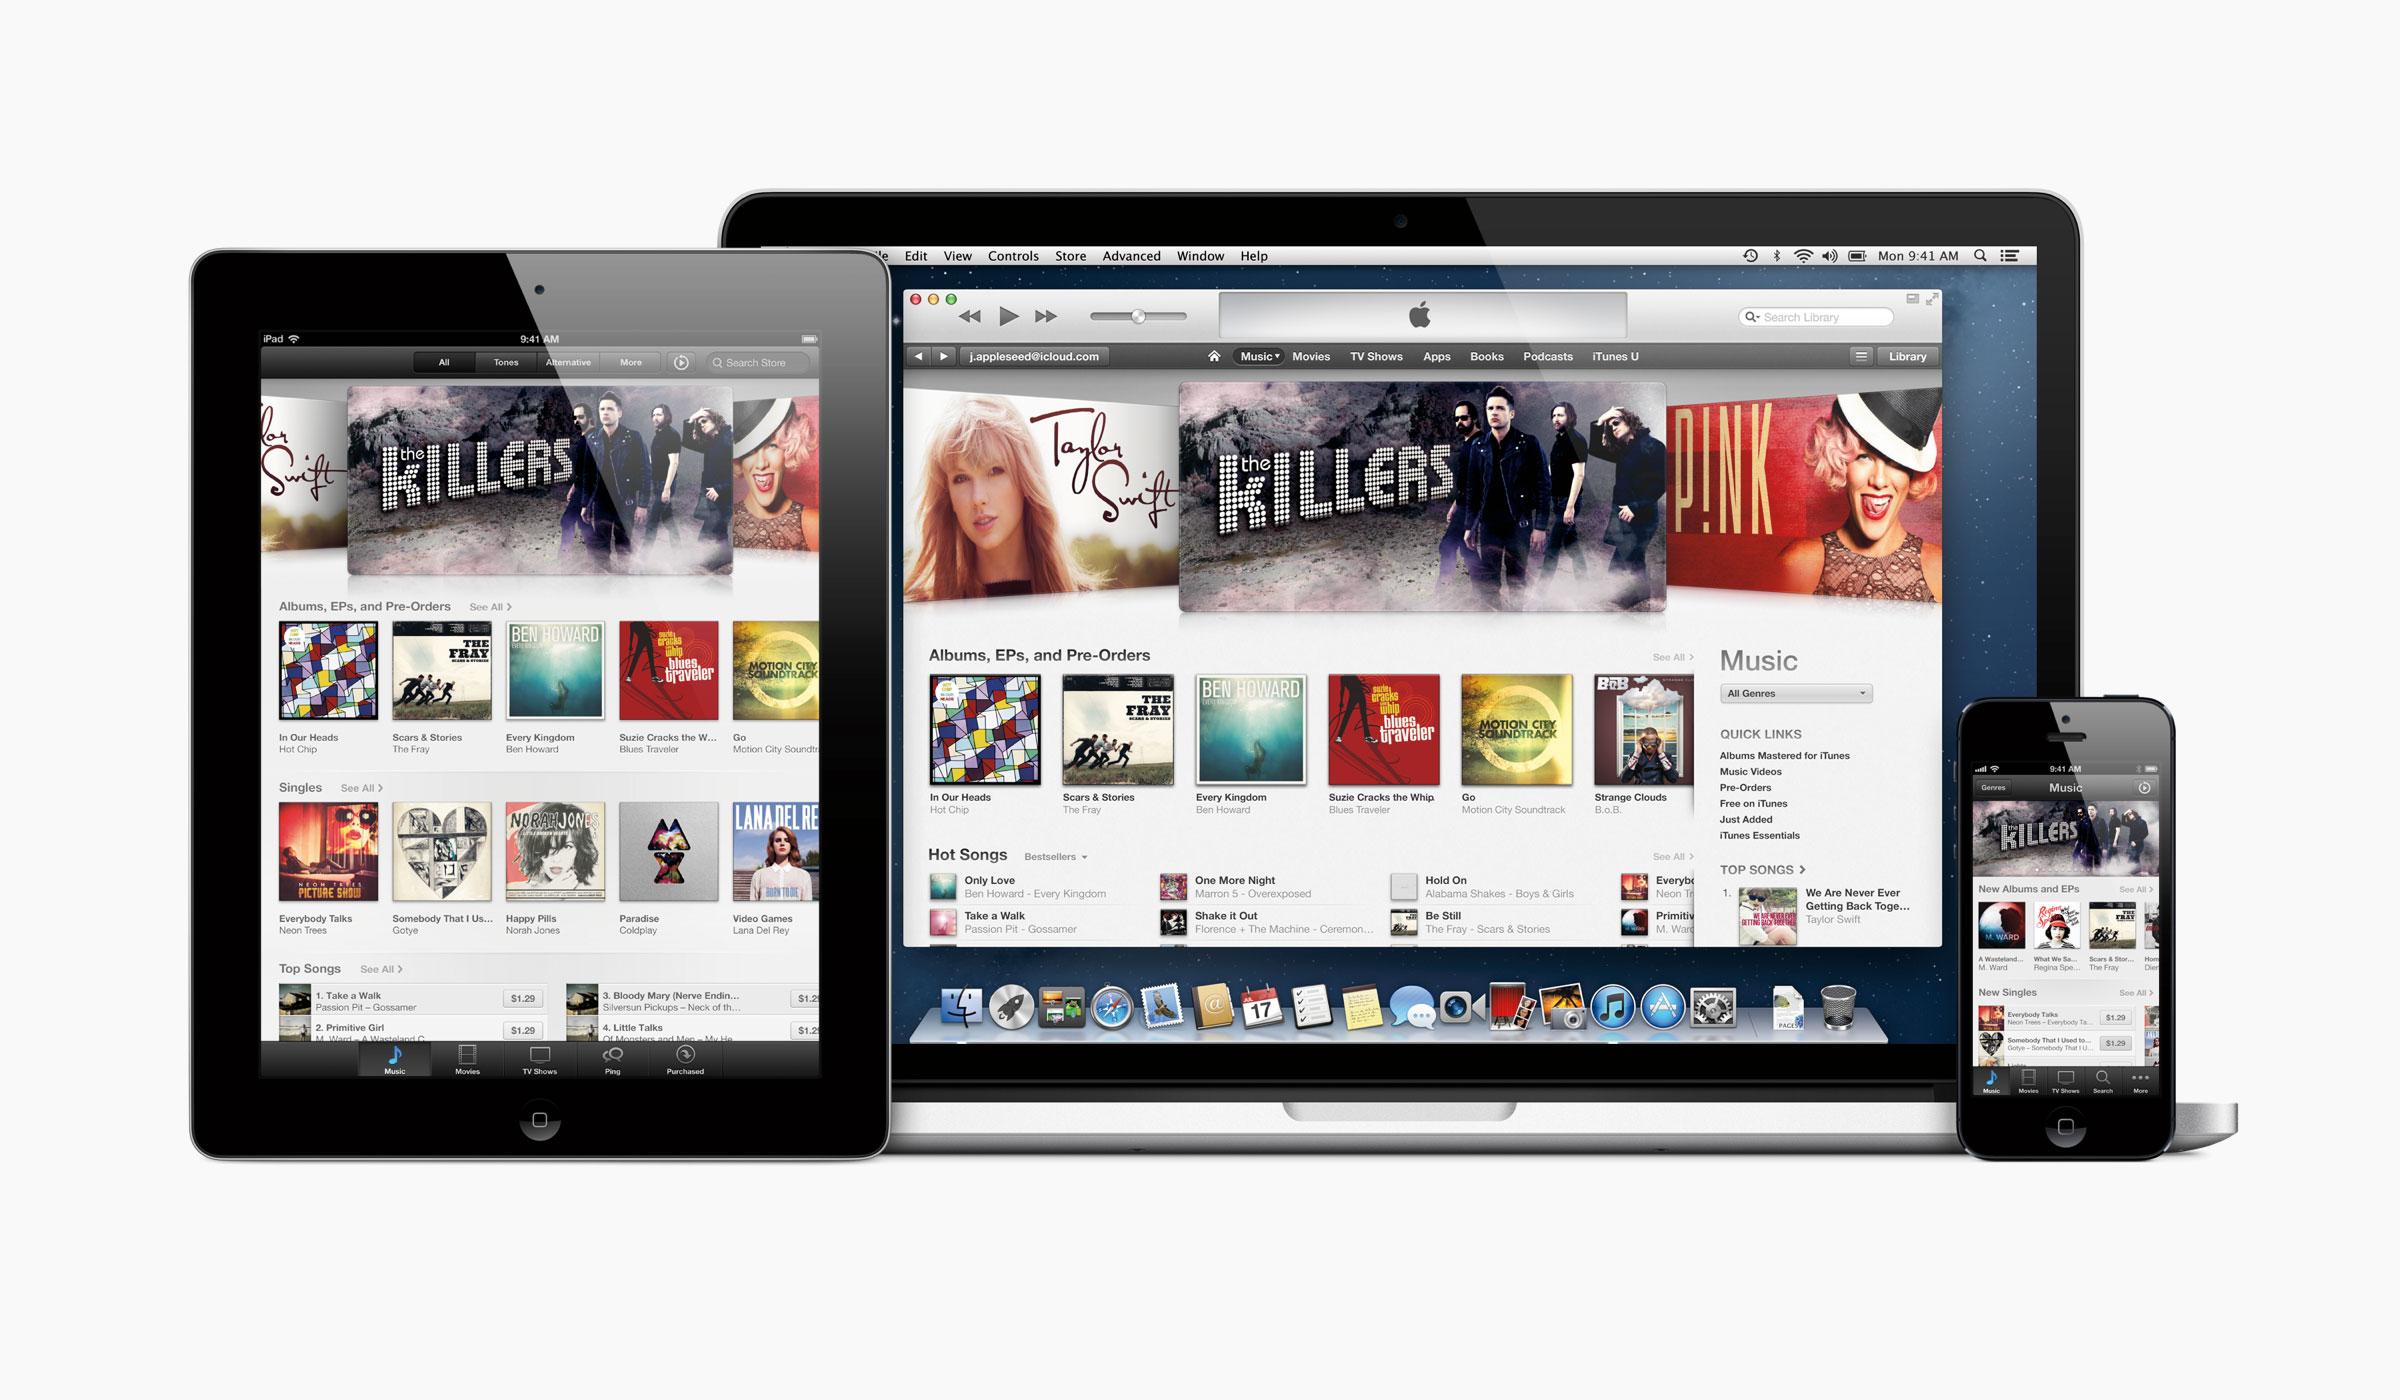 iPad_15inch_MBP_wRet_iPhone_5_iTunes_PRINT-2